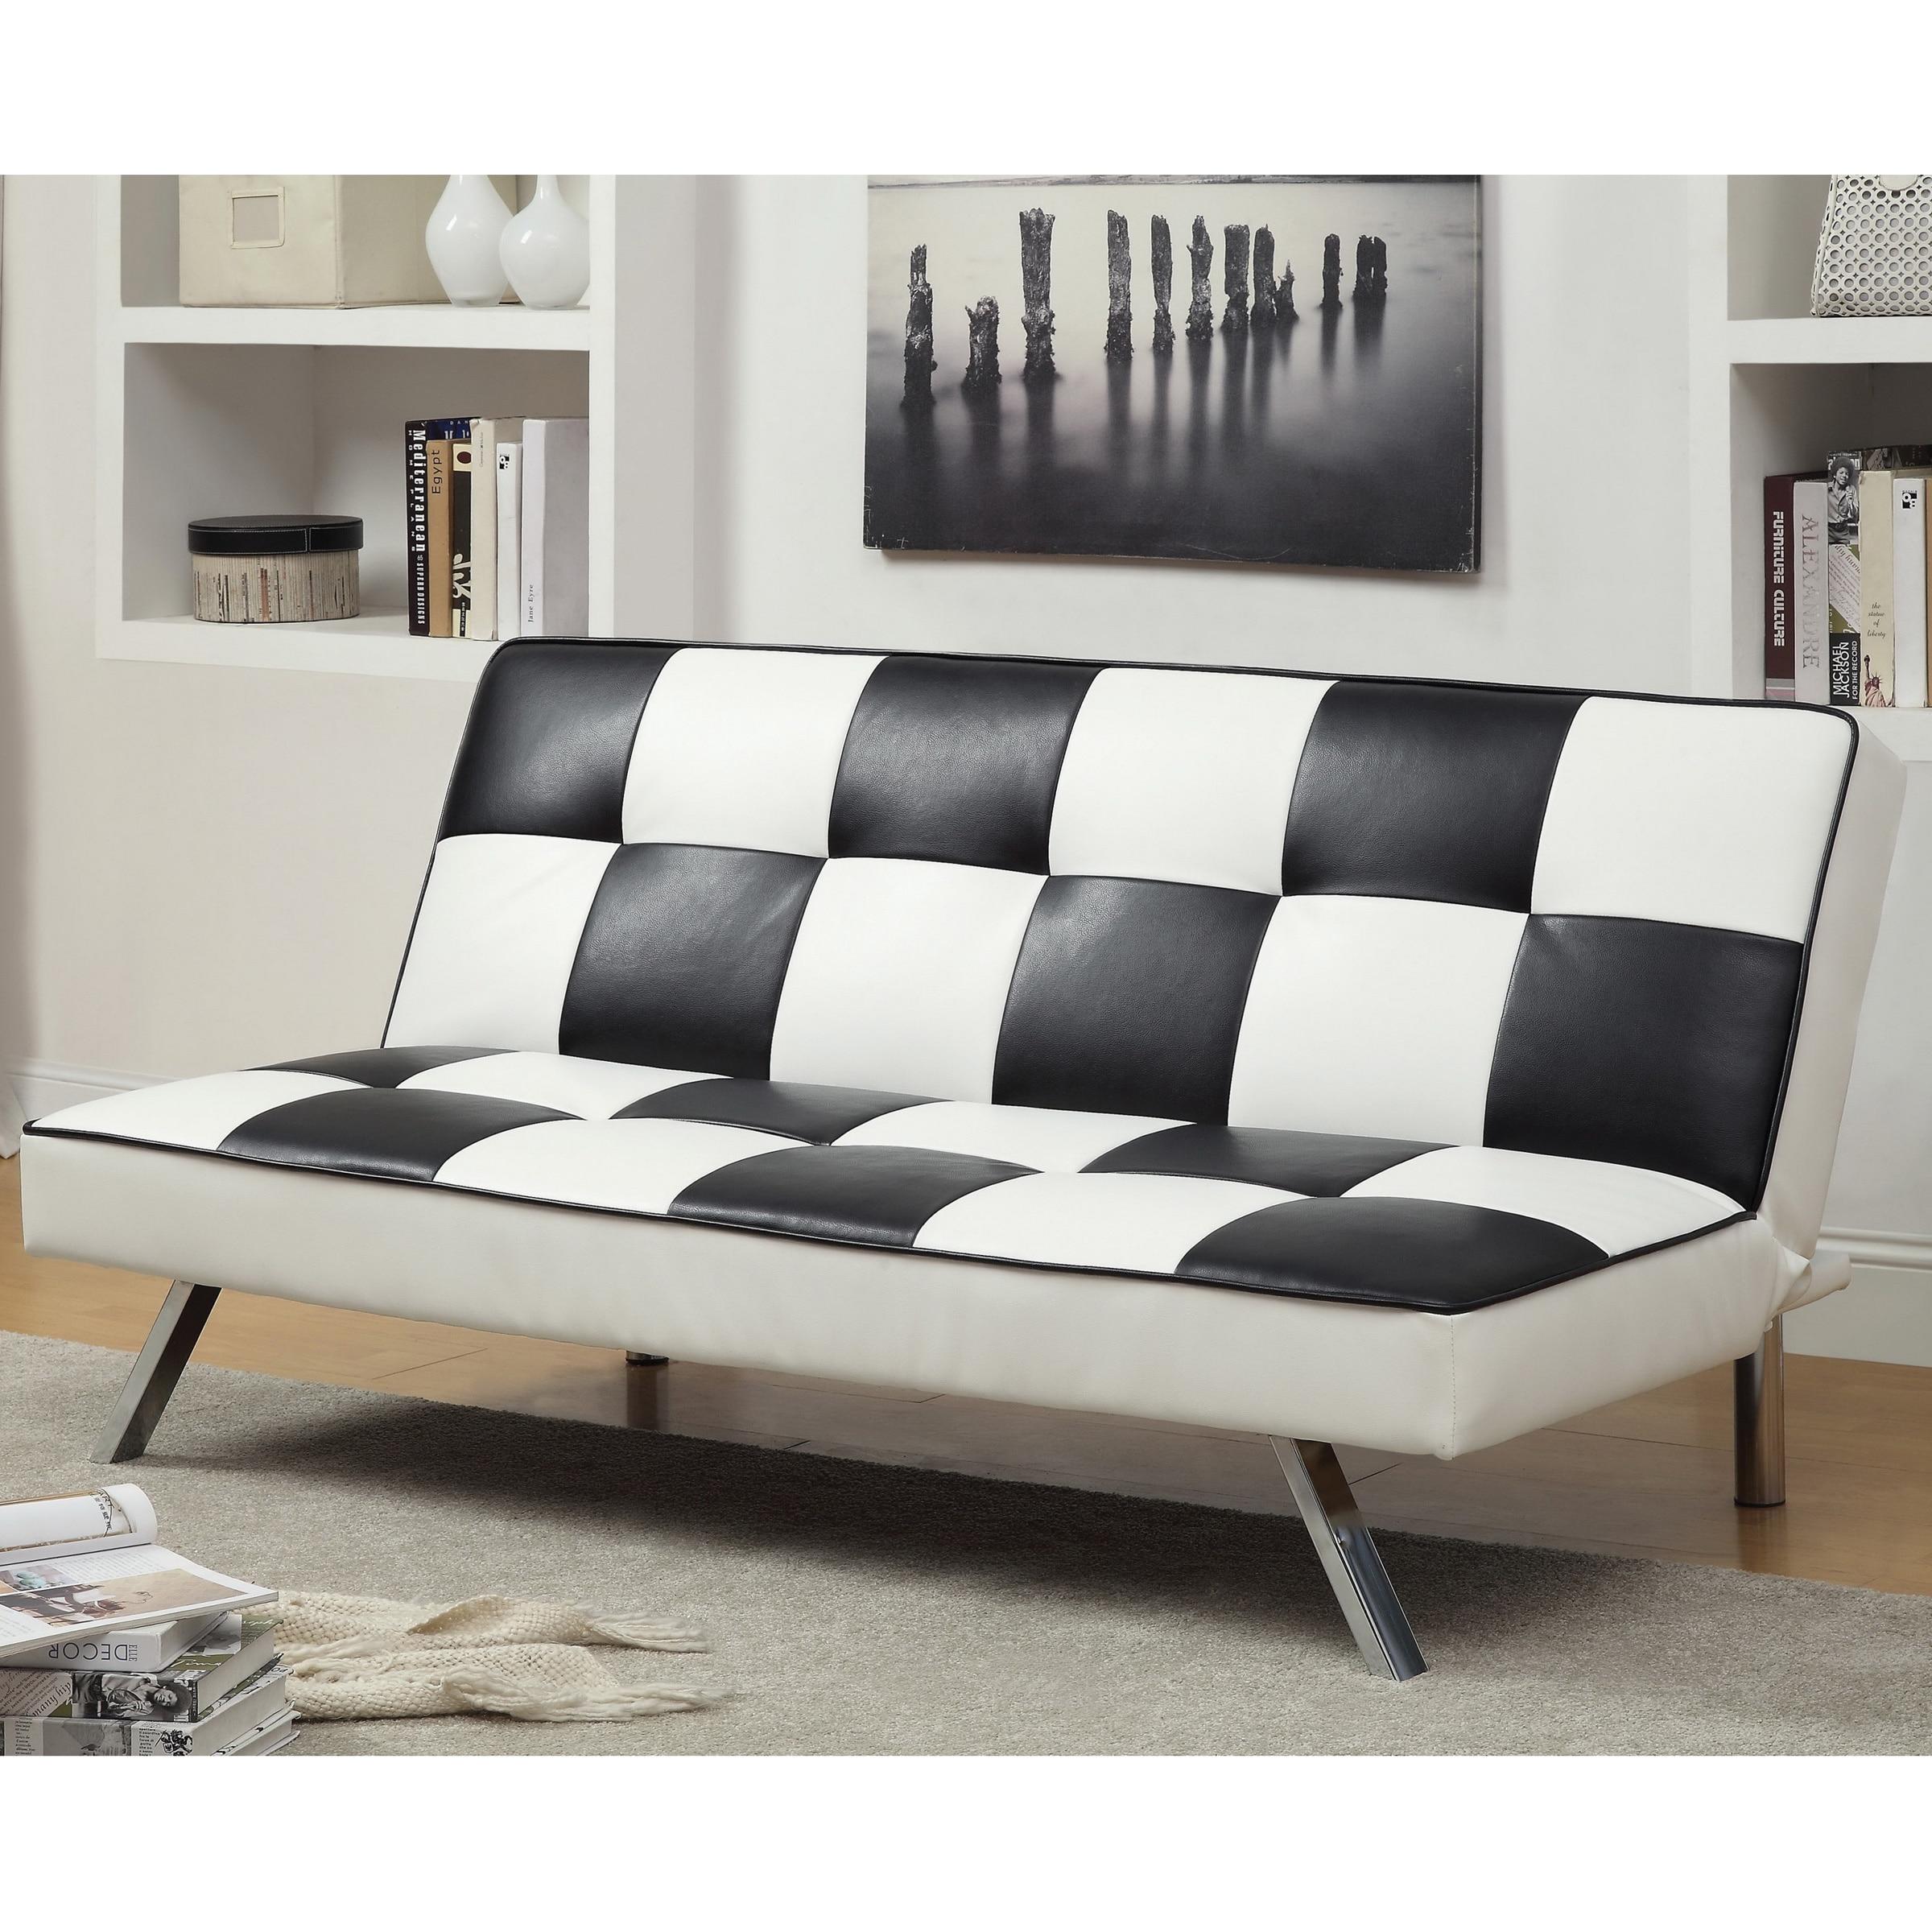 Apis Modern Retro Black White Checker Leatherette Futon Free Shipping Today Com 8372181